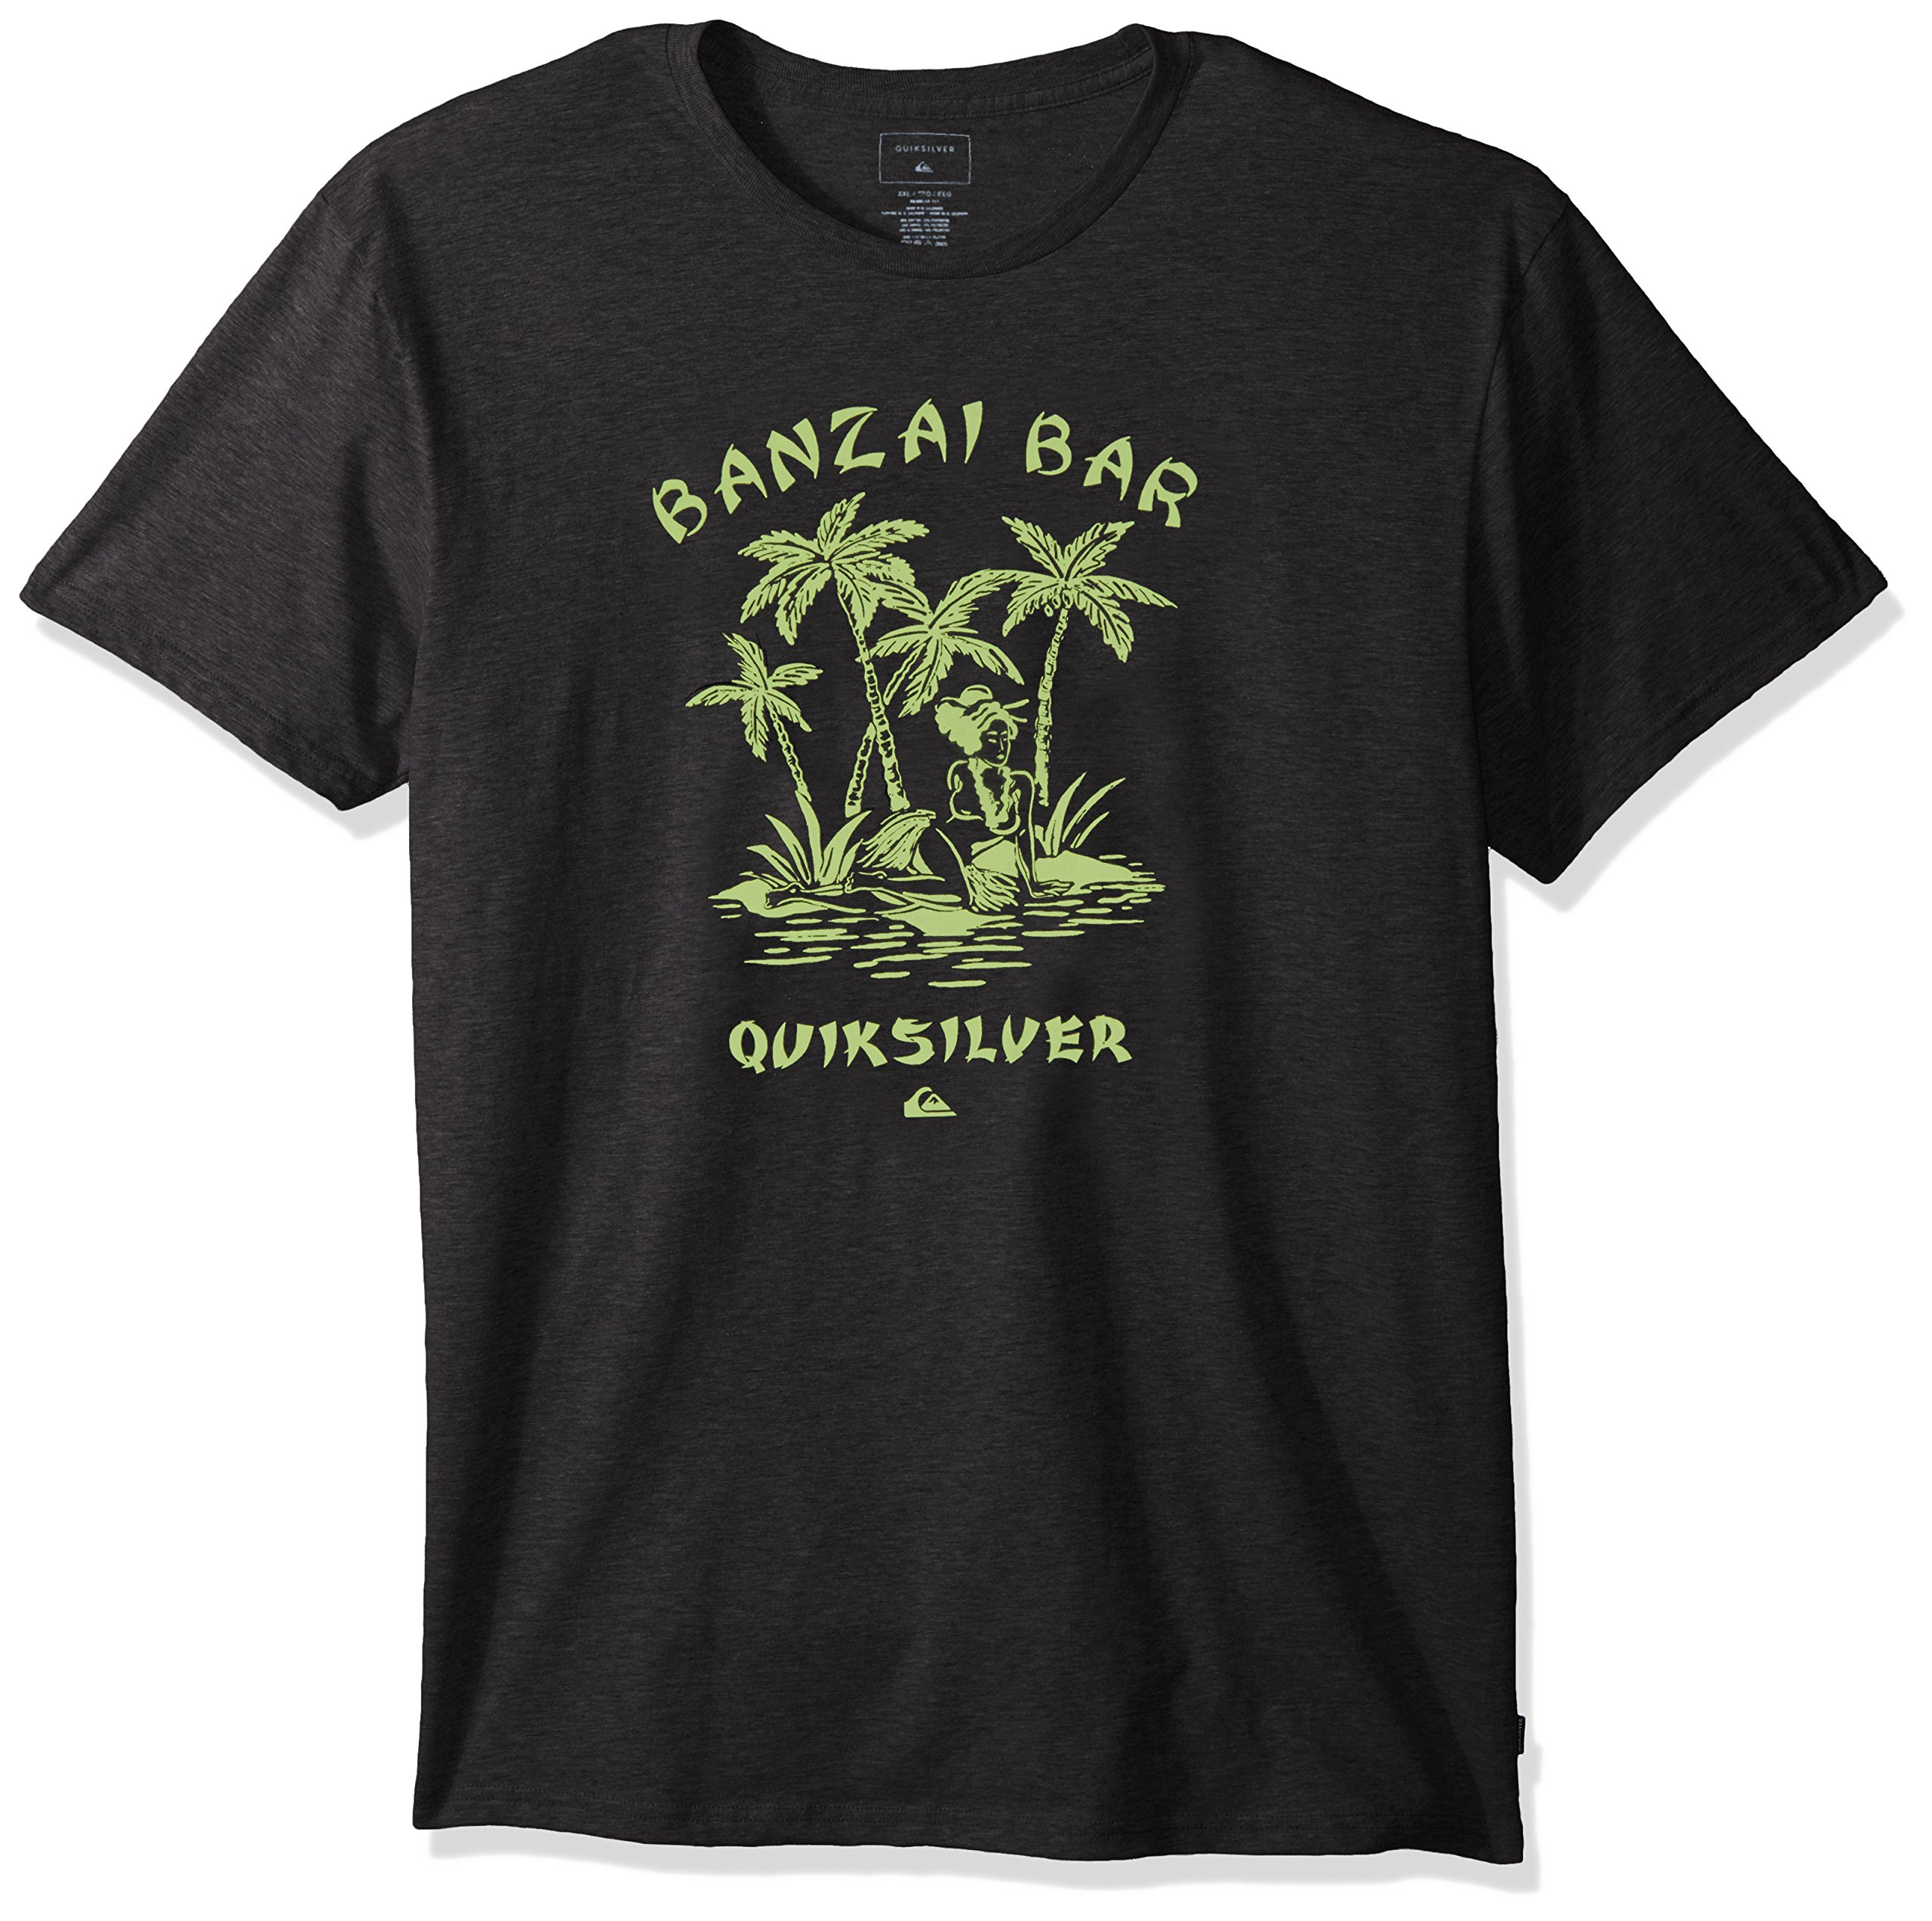 Quiksilver Men's Sunset Parlor Tee Shirt, Charcoal Heather, XL